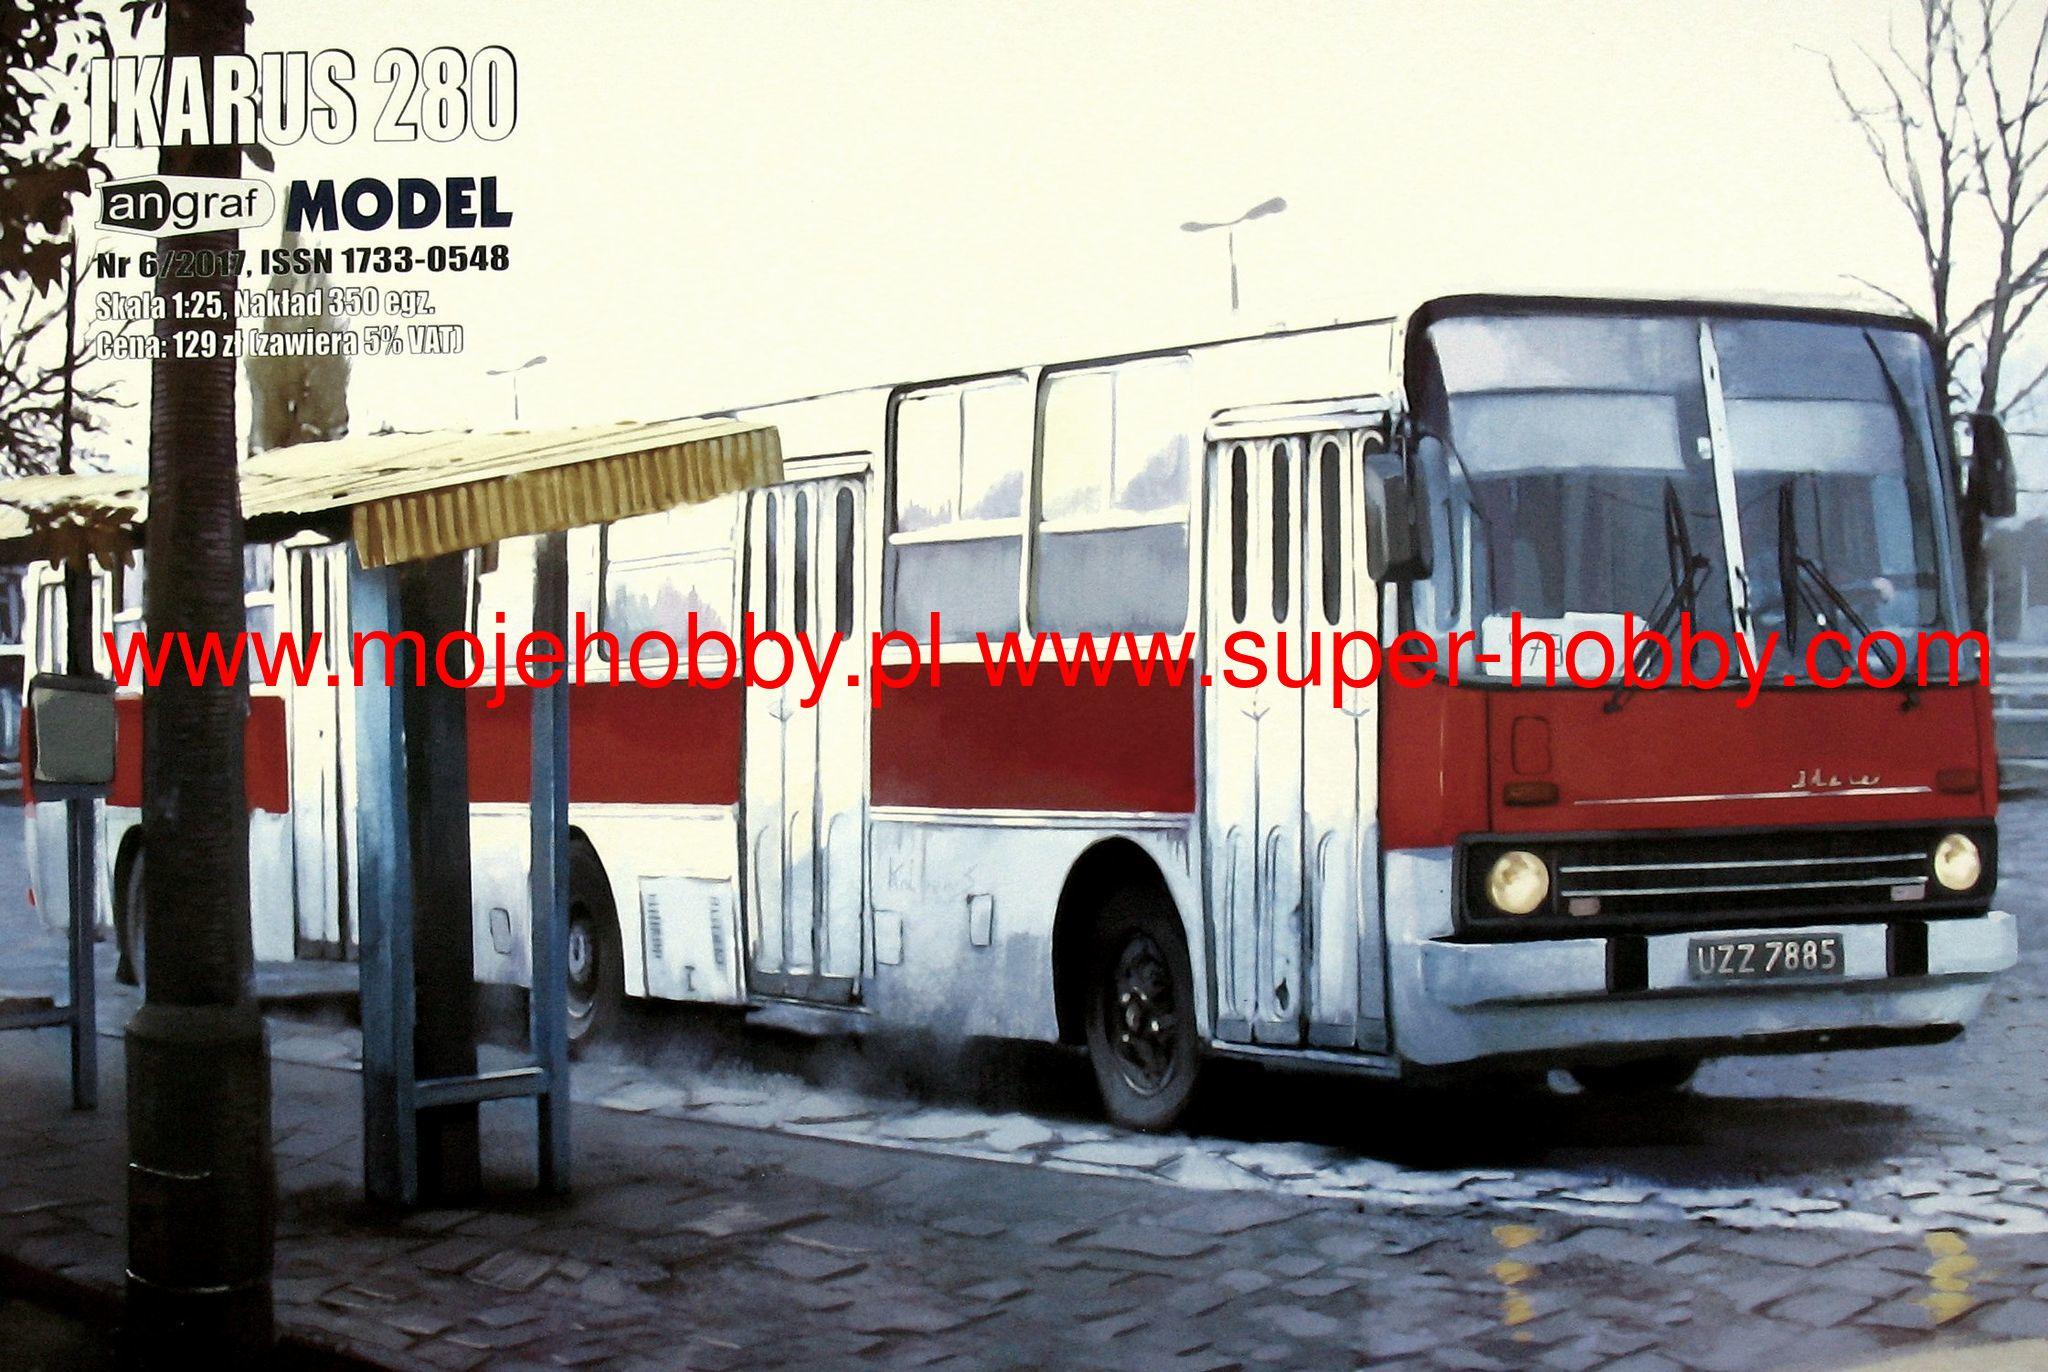 Ikarus 280 Angraf 6 2017